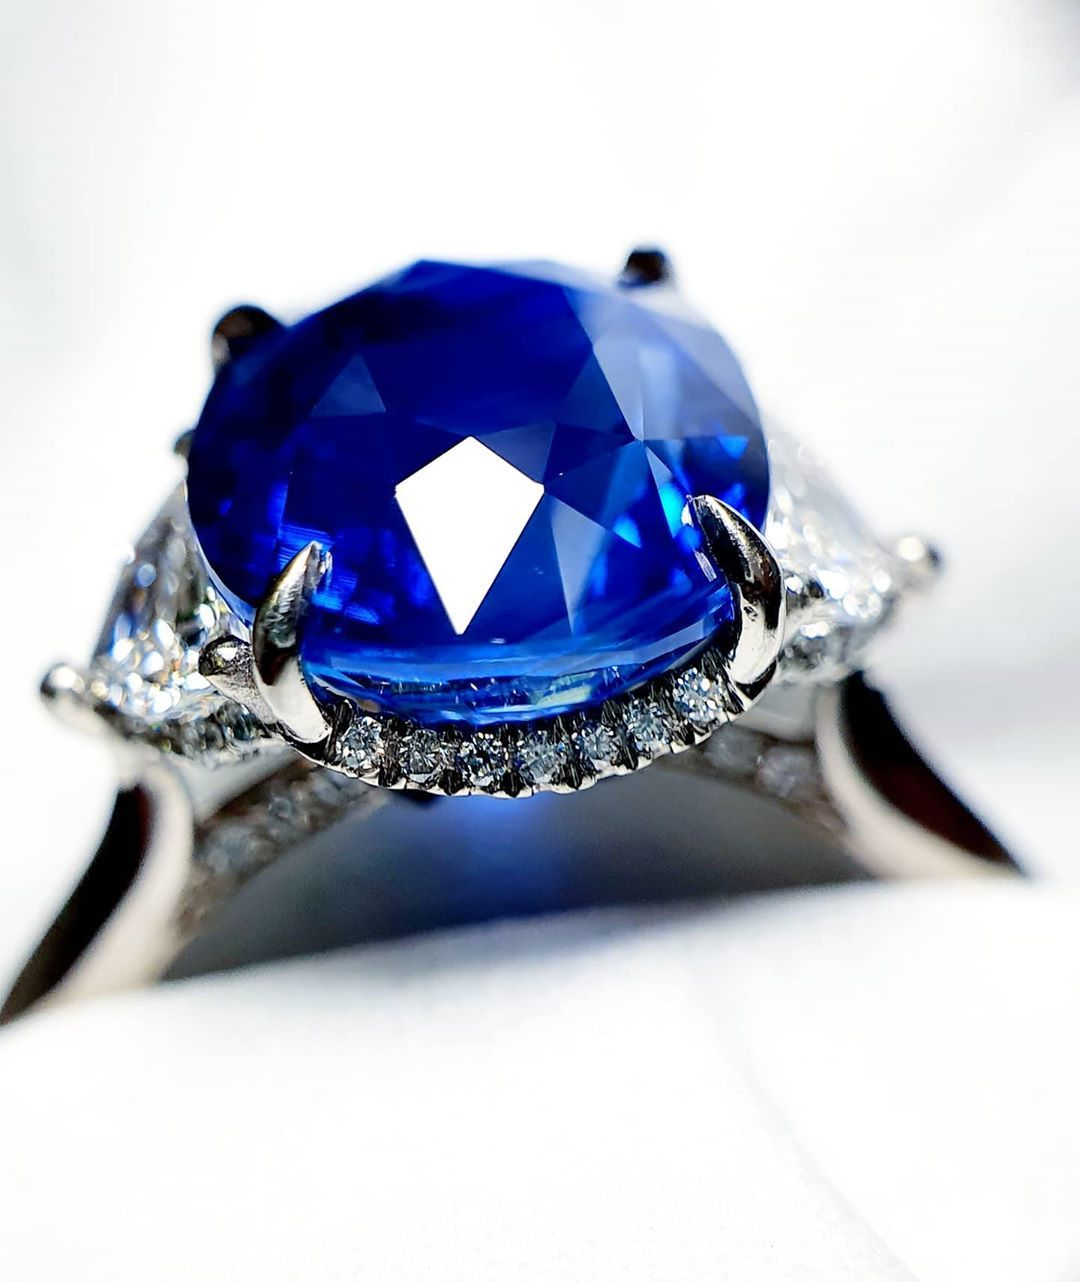 My Craft jewellery Art It's All About The Details... 🐽🙃🎨💎💍 22:05:2020 #moment #feel #view #finejewelry #sydneylocal #handcraft  #girlsbestfriend #diamondring #arts  #cyberdiary  #whitediamond  #highjewelry  #handmadejewellery  #elegant  #dressring  #小玩意  #jewellery #classy #dailysnap #simplicity #sydneyjewellery  #jewelry #craft #artisanjewelry